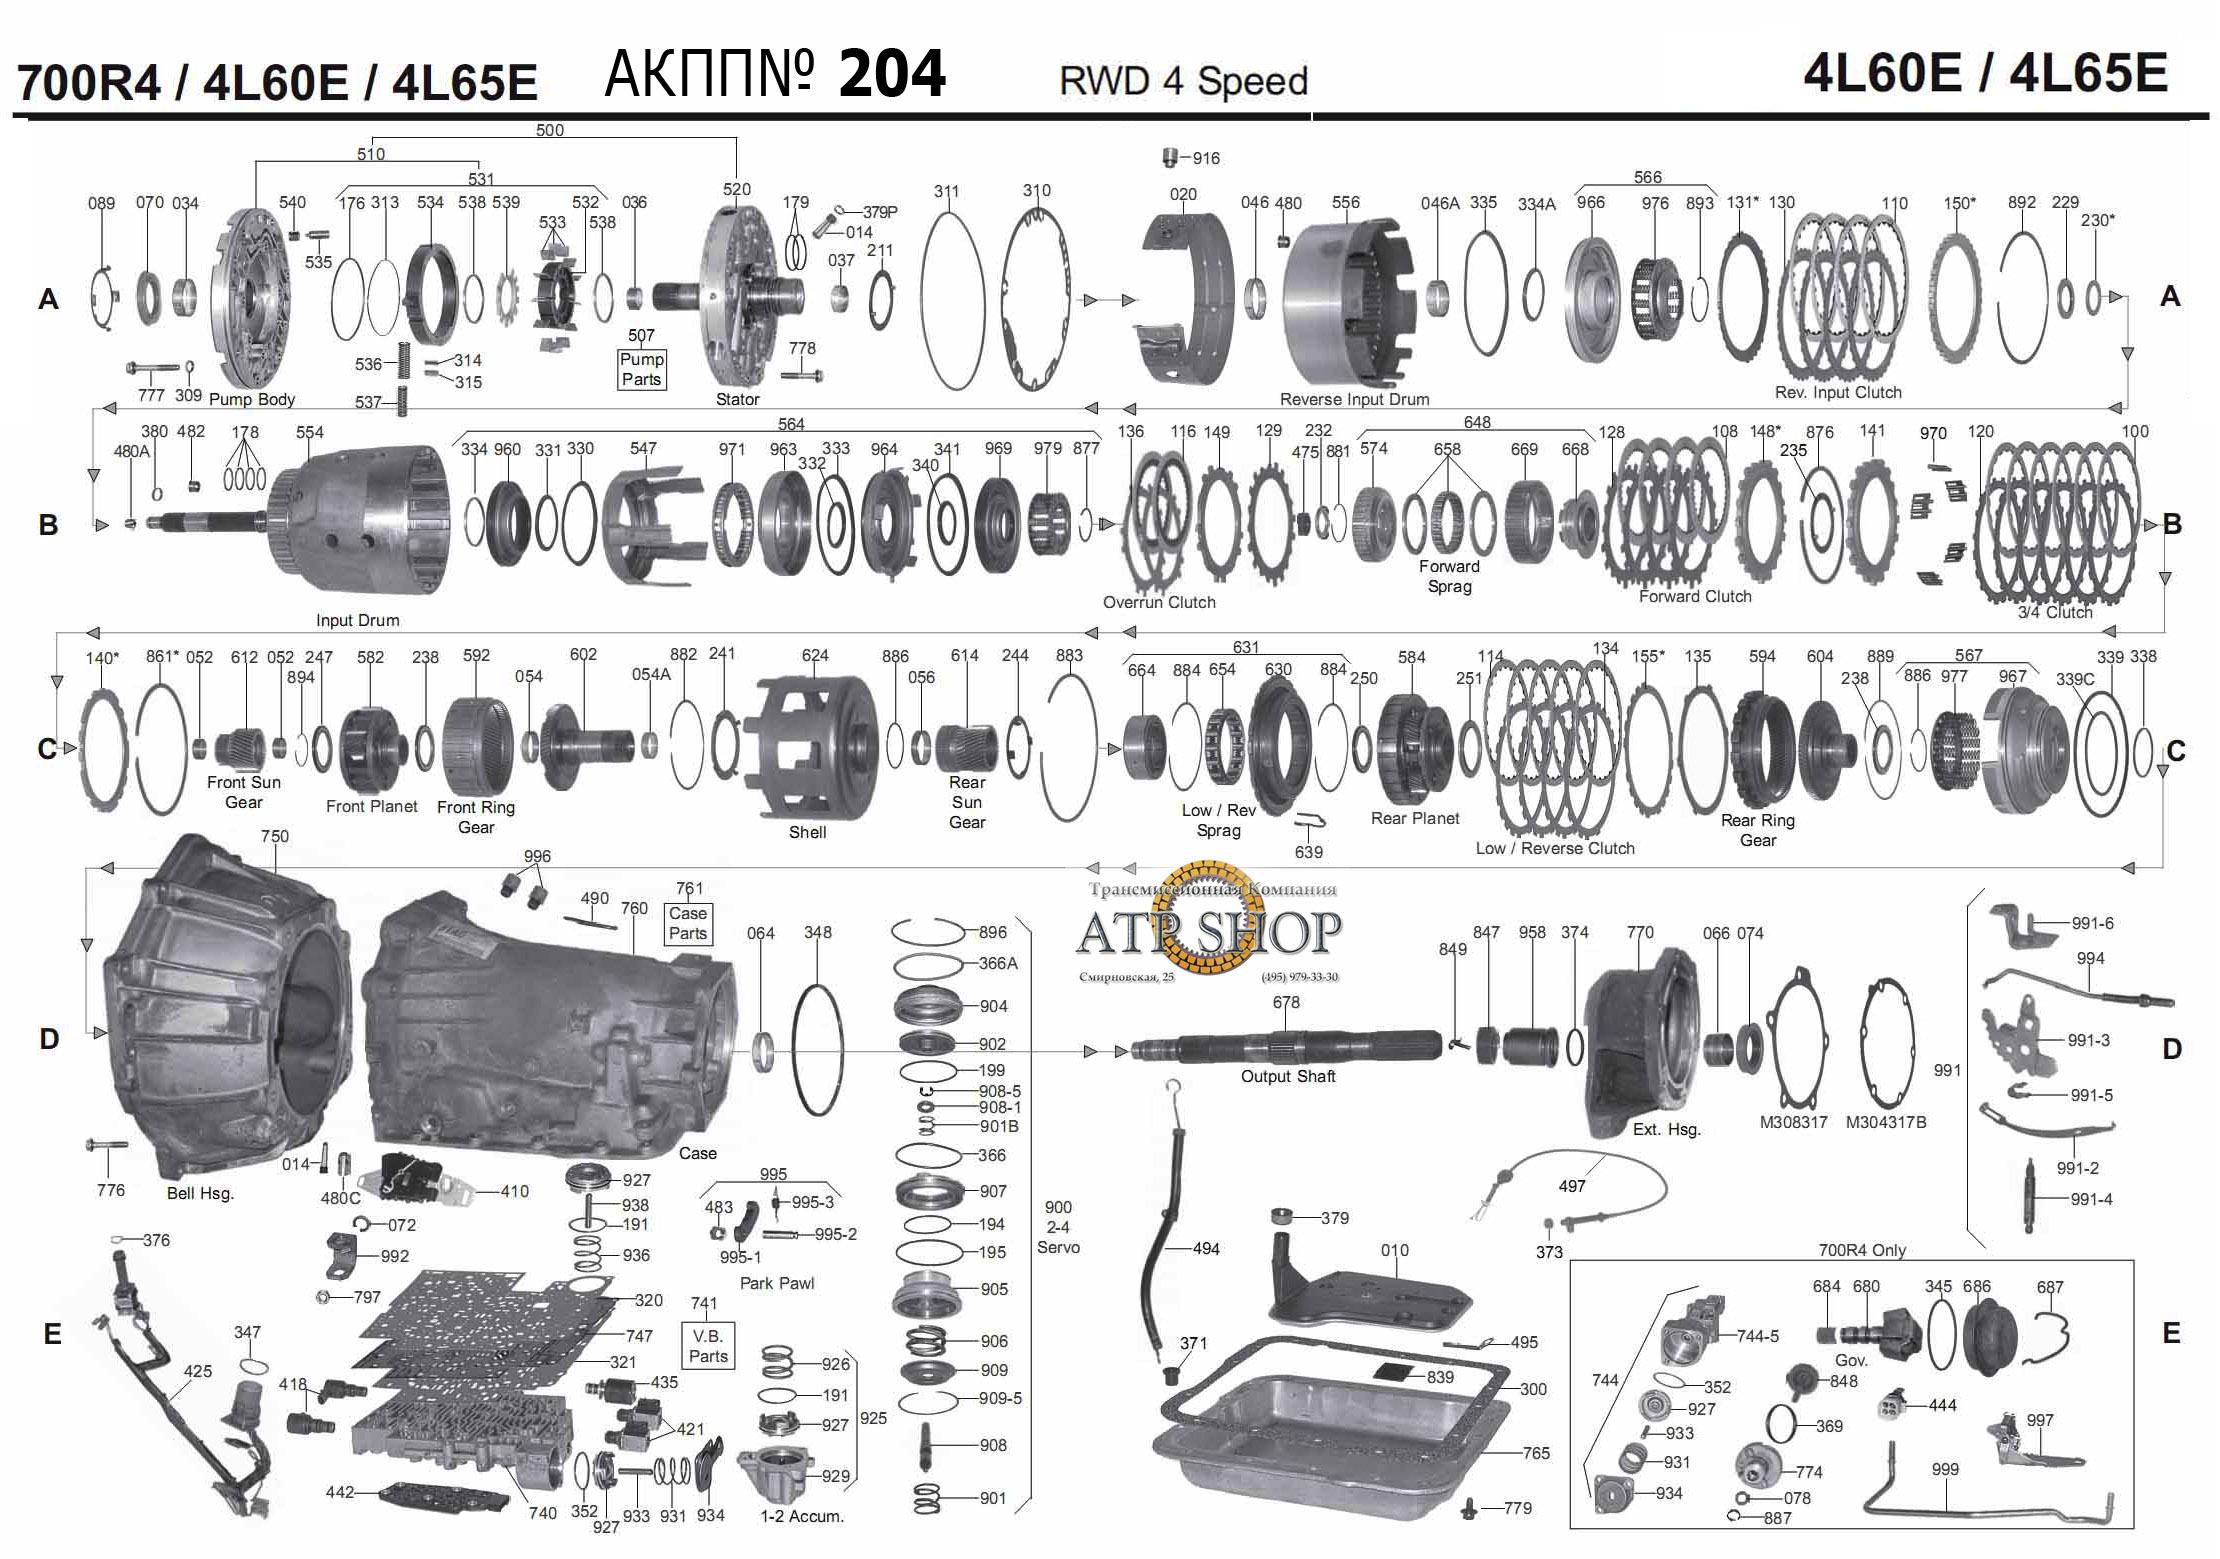 4L60E /4L65E /4L70E (700R4) Описание, Болезни, справочная